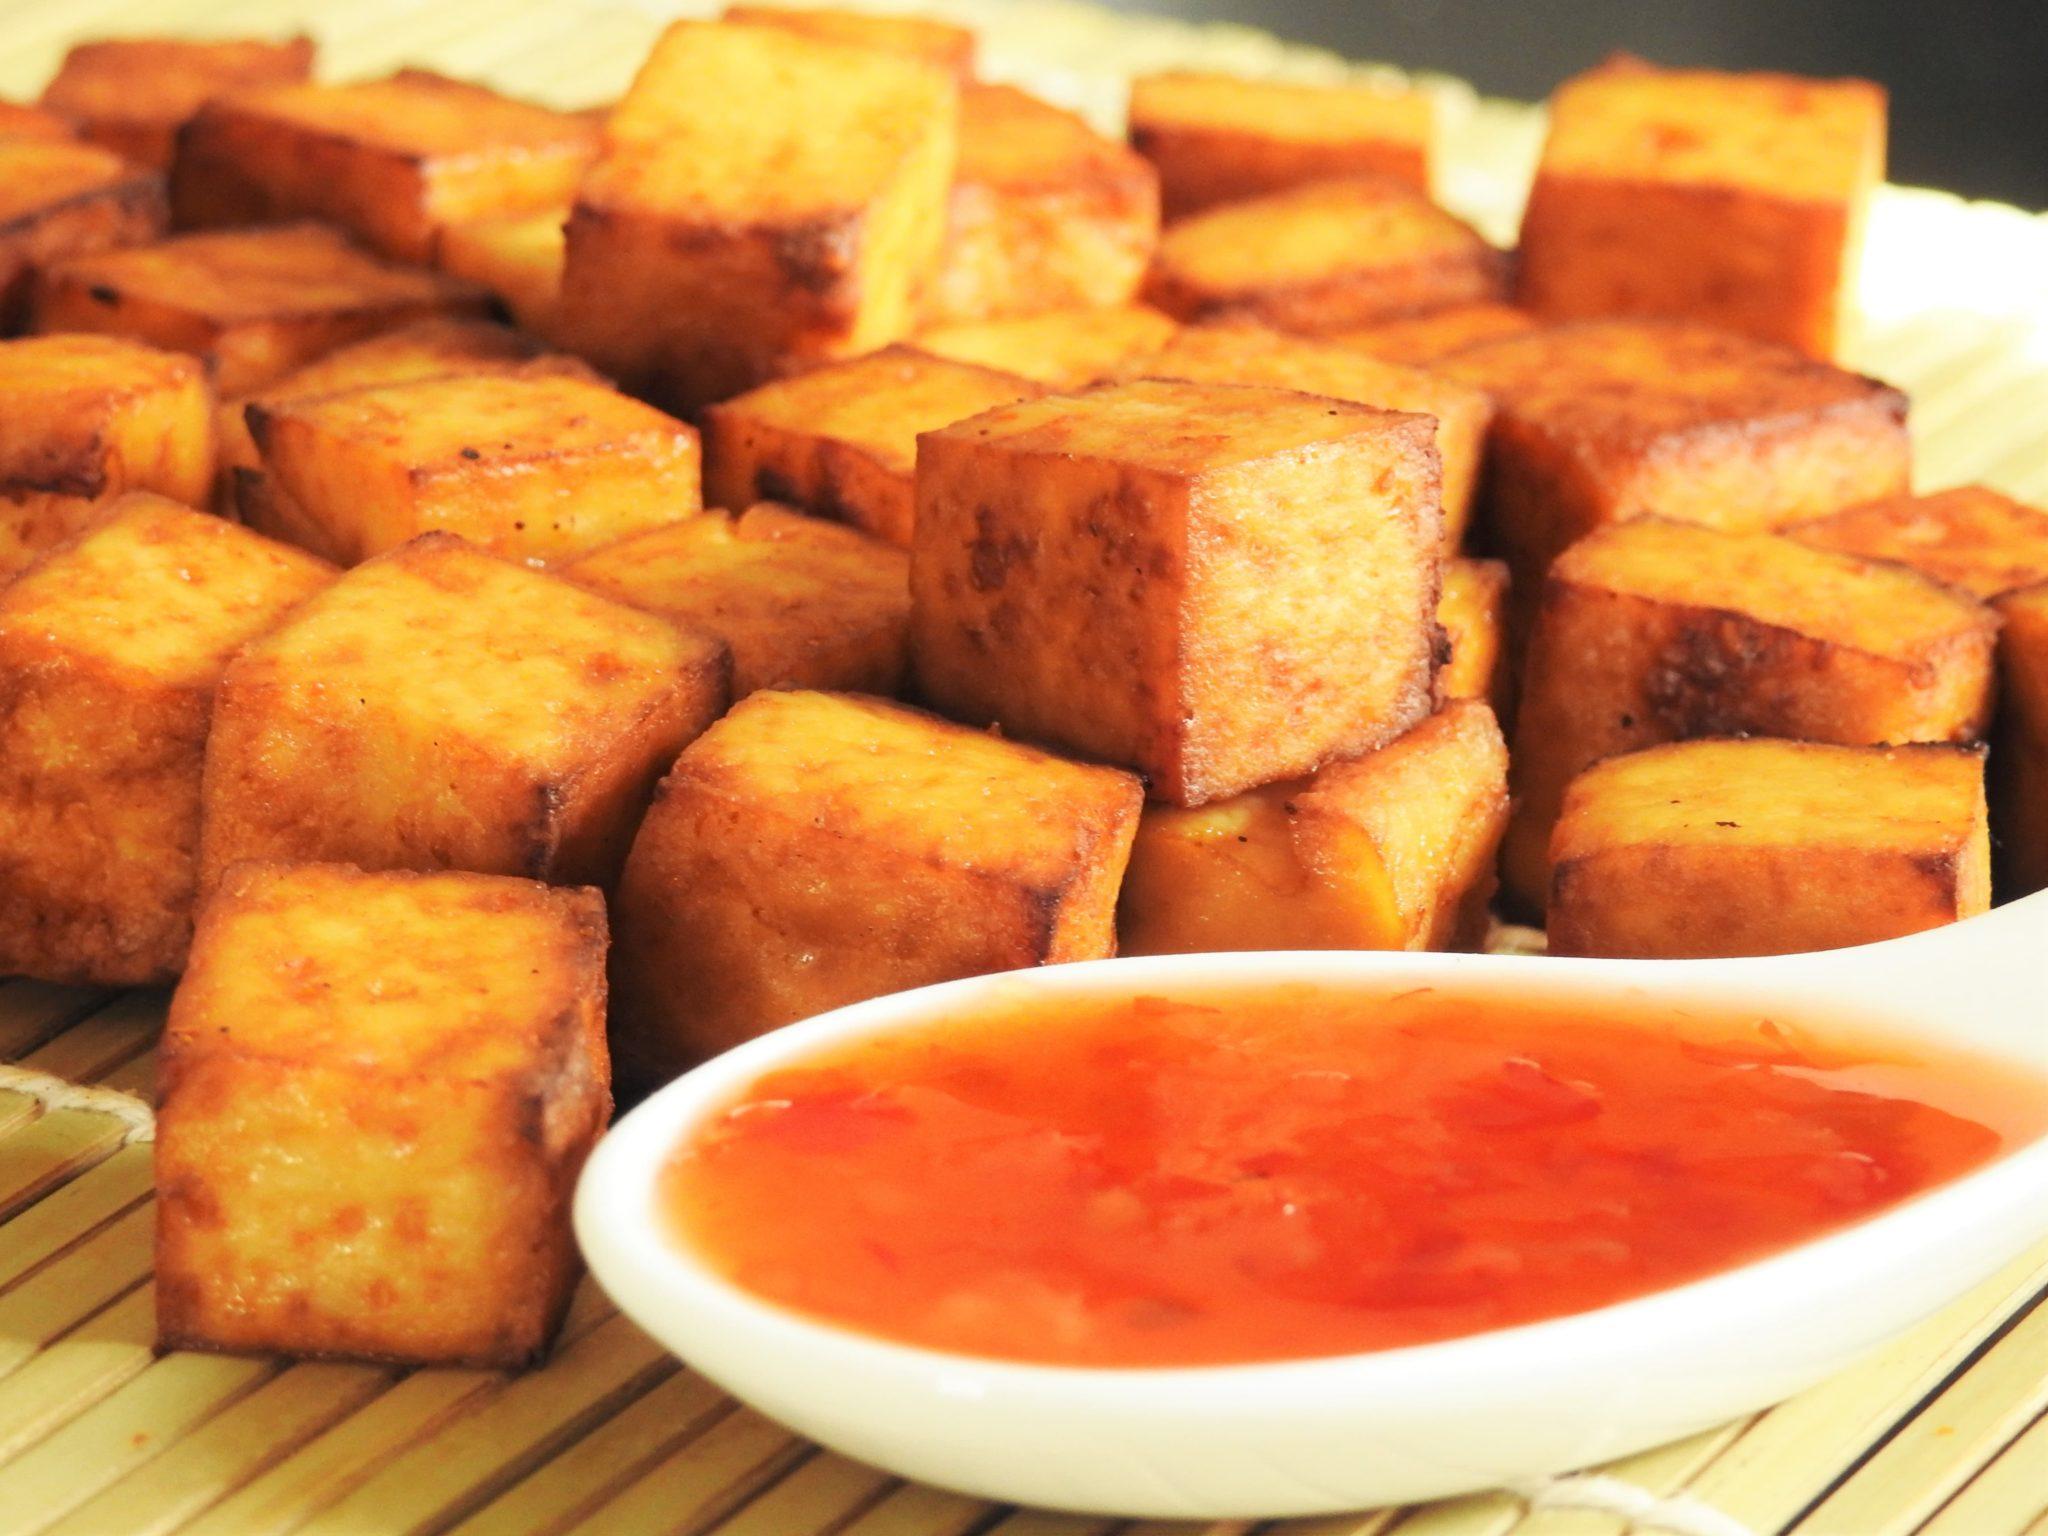 Tofu Snack with Sweet Chili Sauce